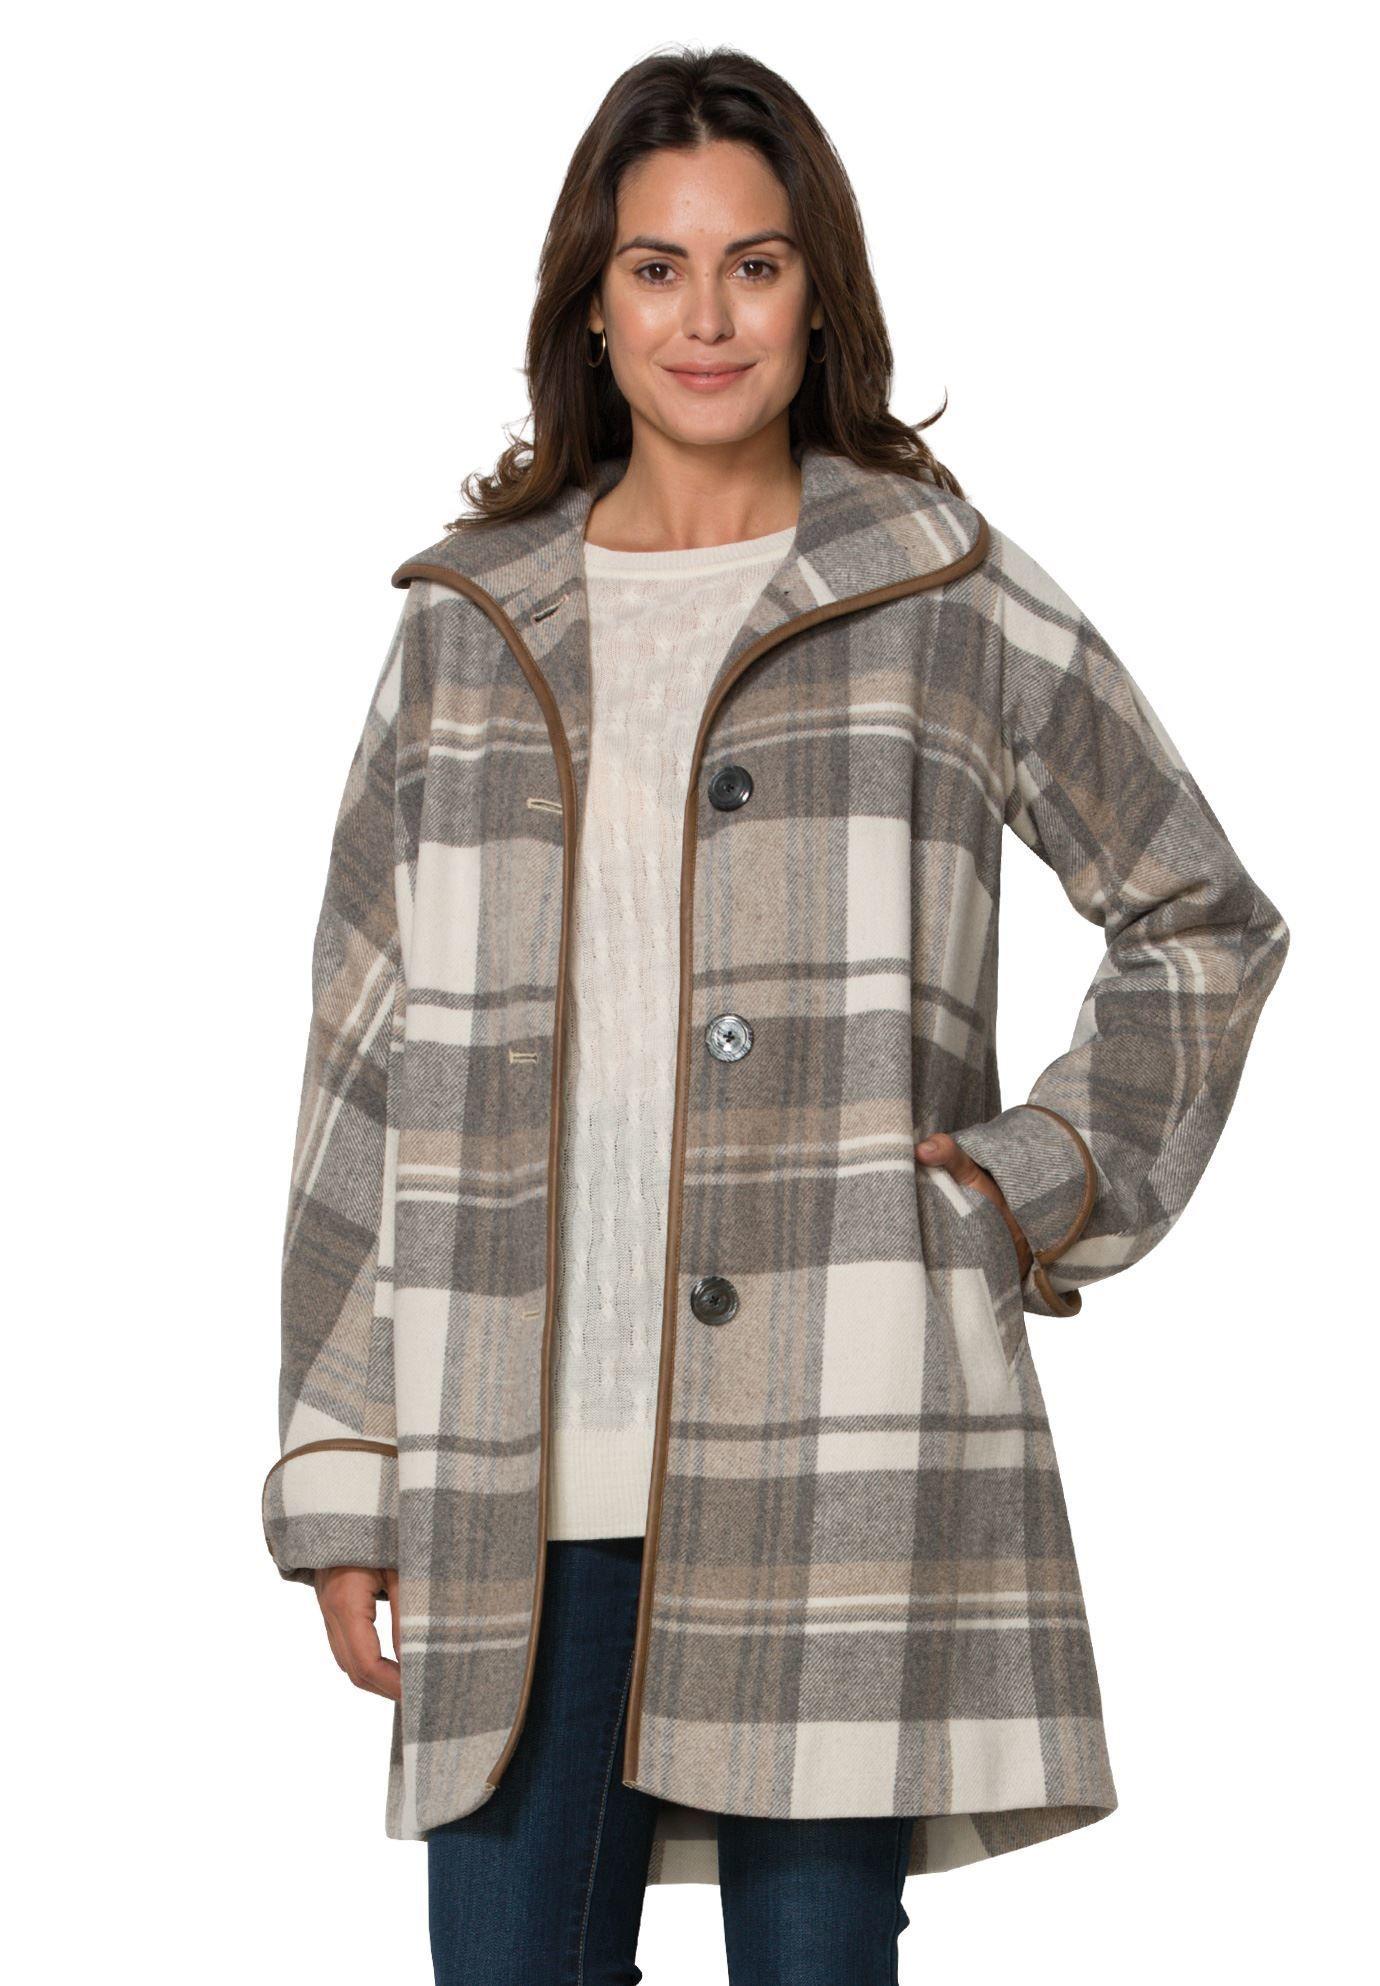 be120742dcd Faux leather trim wool coat - Women s Plus Size Clothing